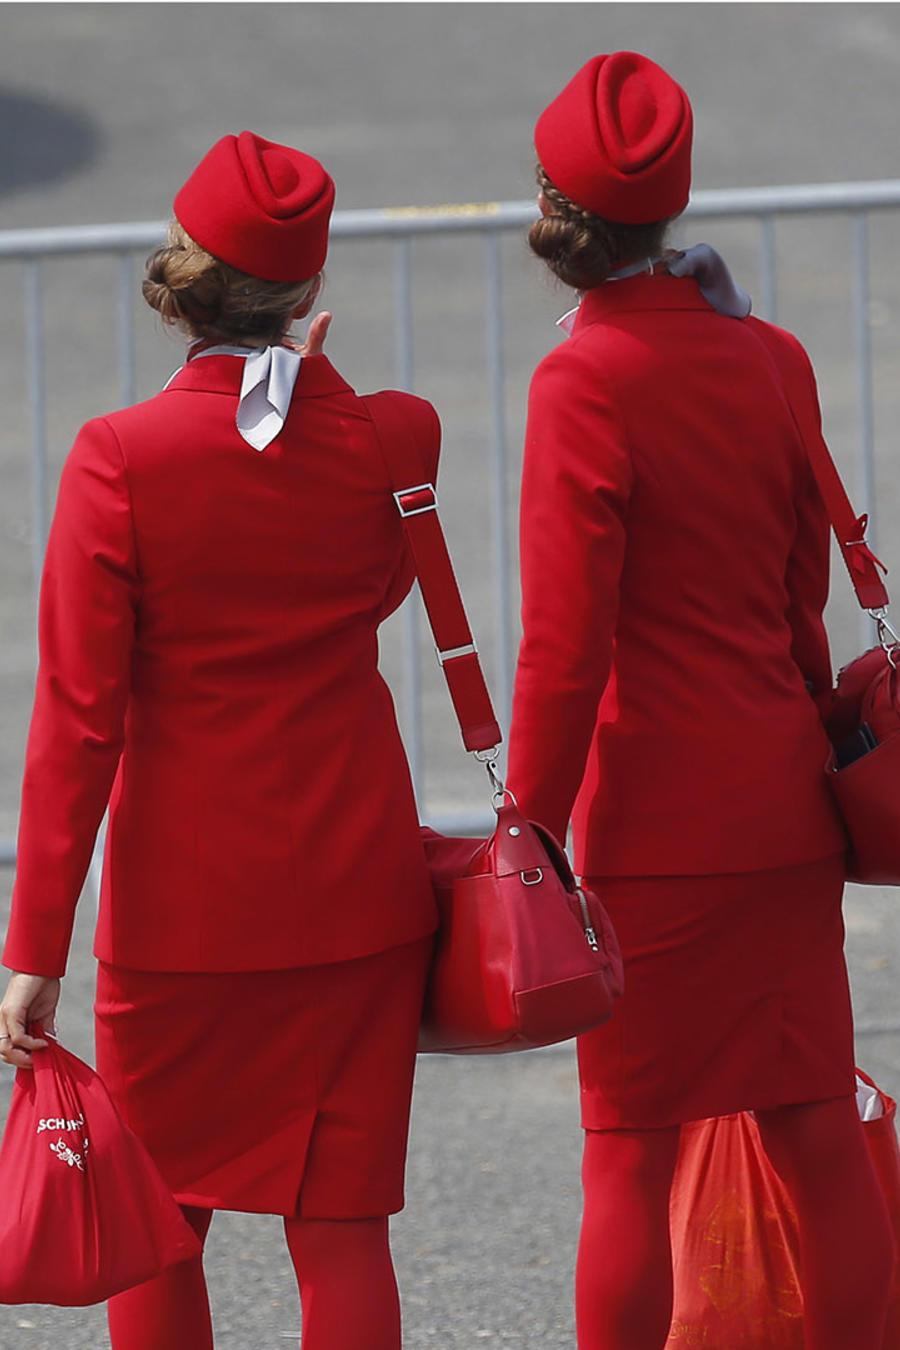 Auxiliares de vuelo